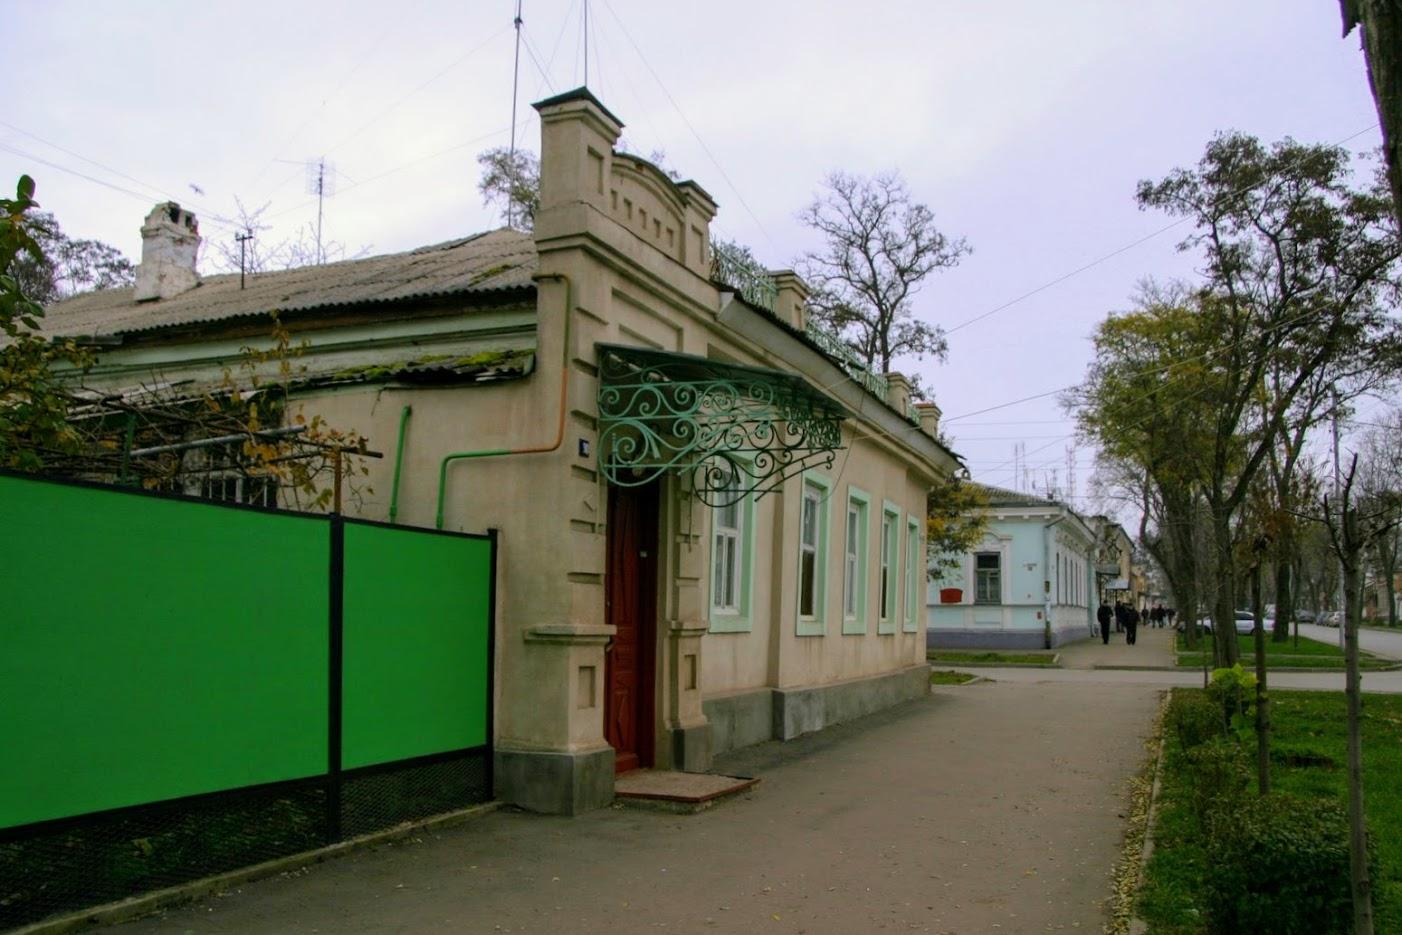 https://sites.google.com/site/istoriceskijtaganrog/cehova-ulica/dom-90